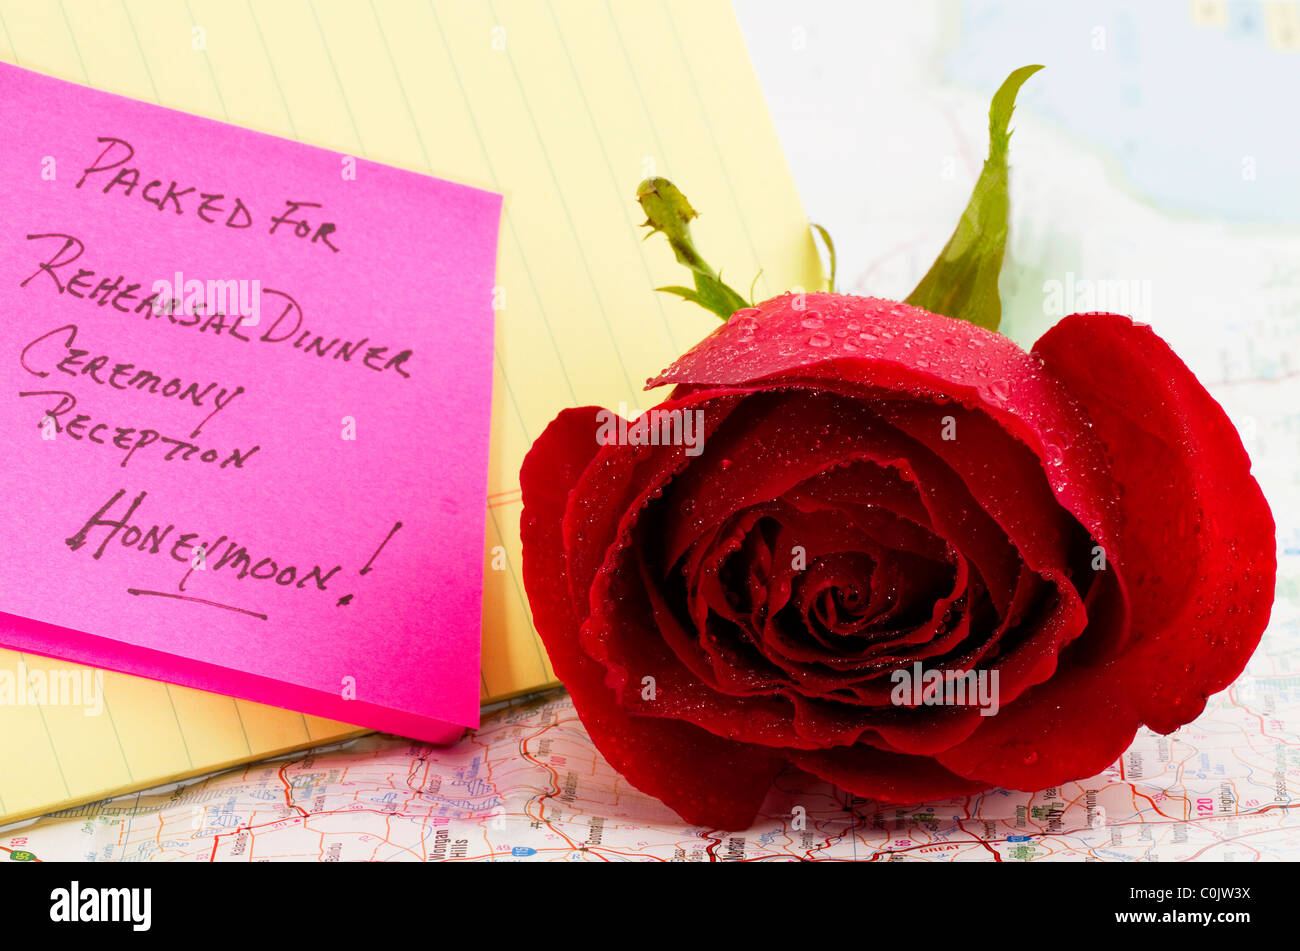 Wedding Plans Stock Photos & Wedding Plans Stock Images - Alamy